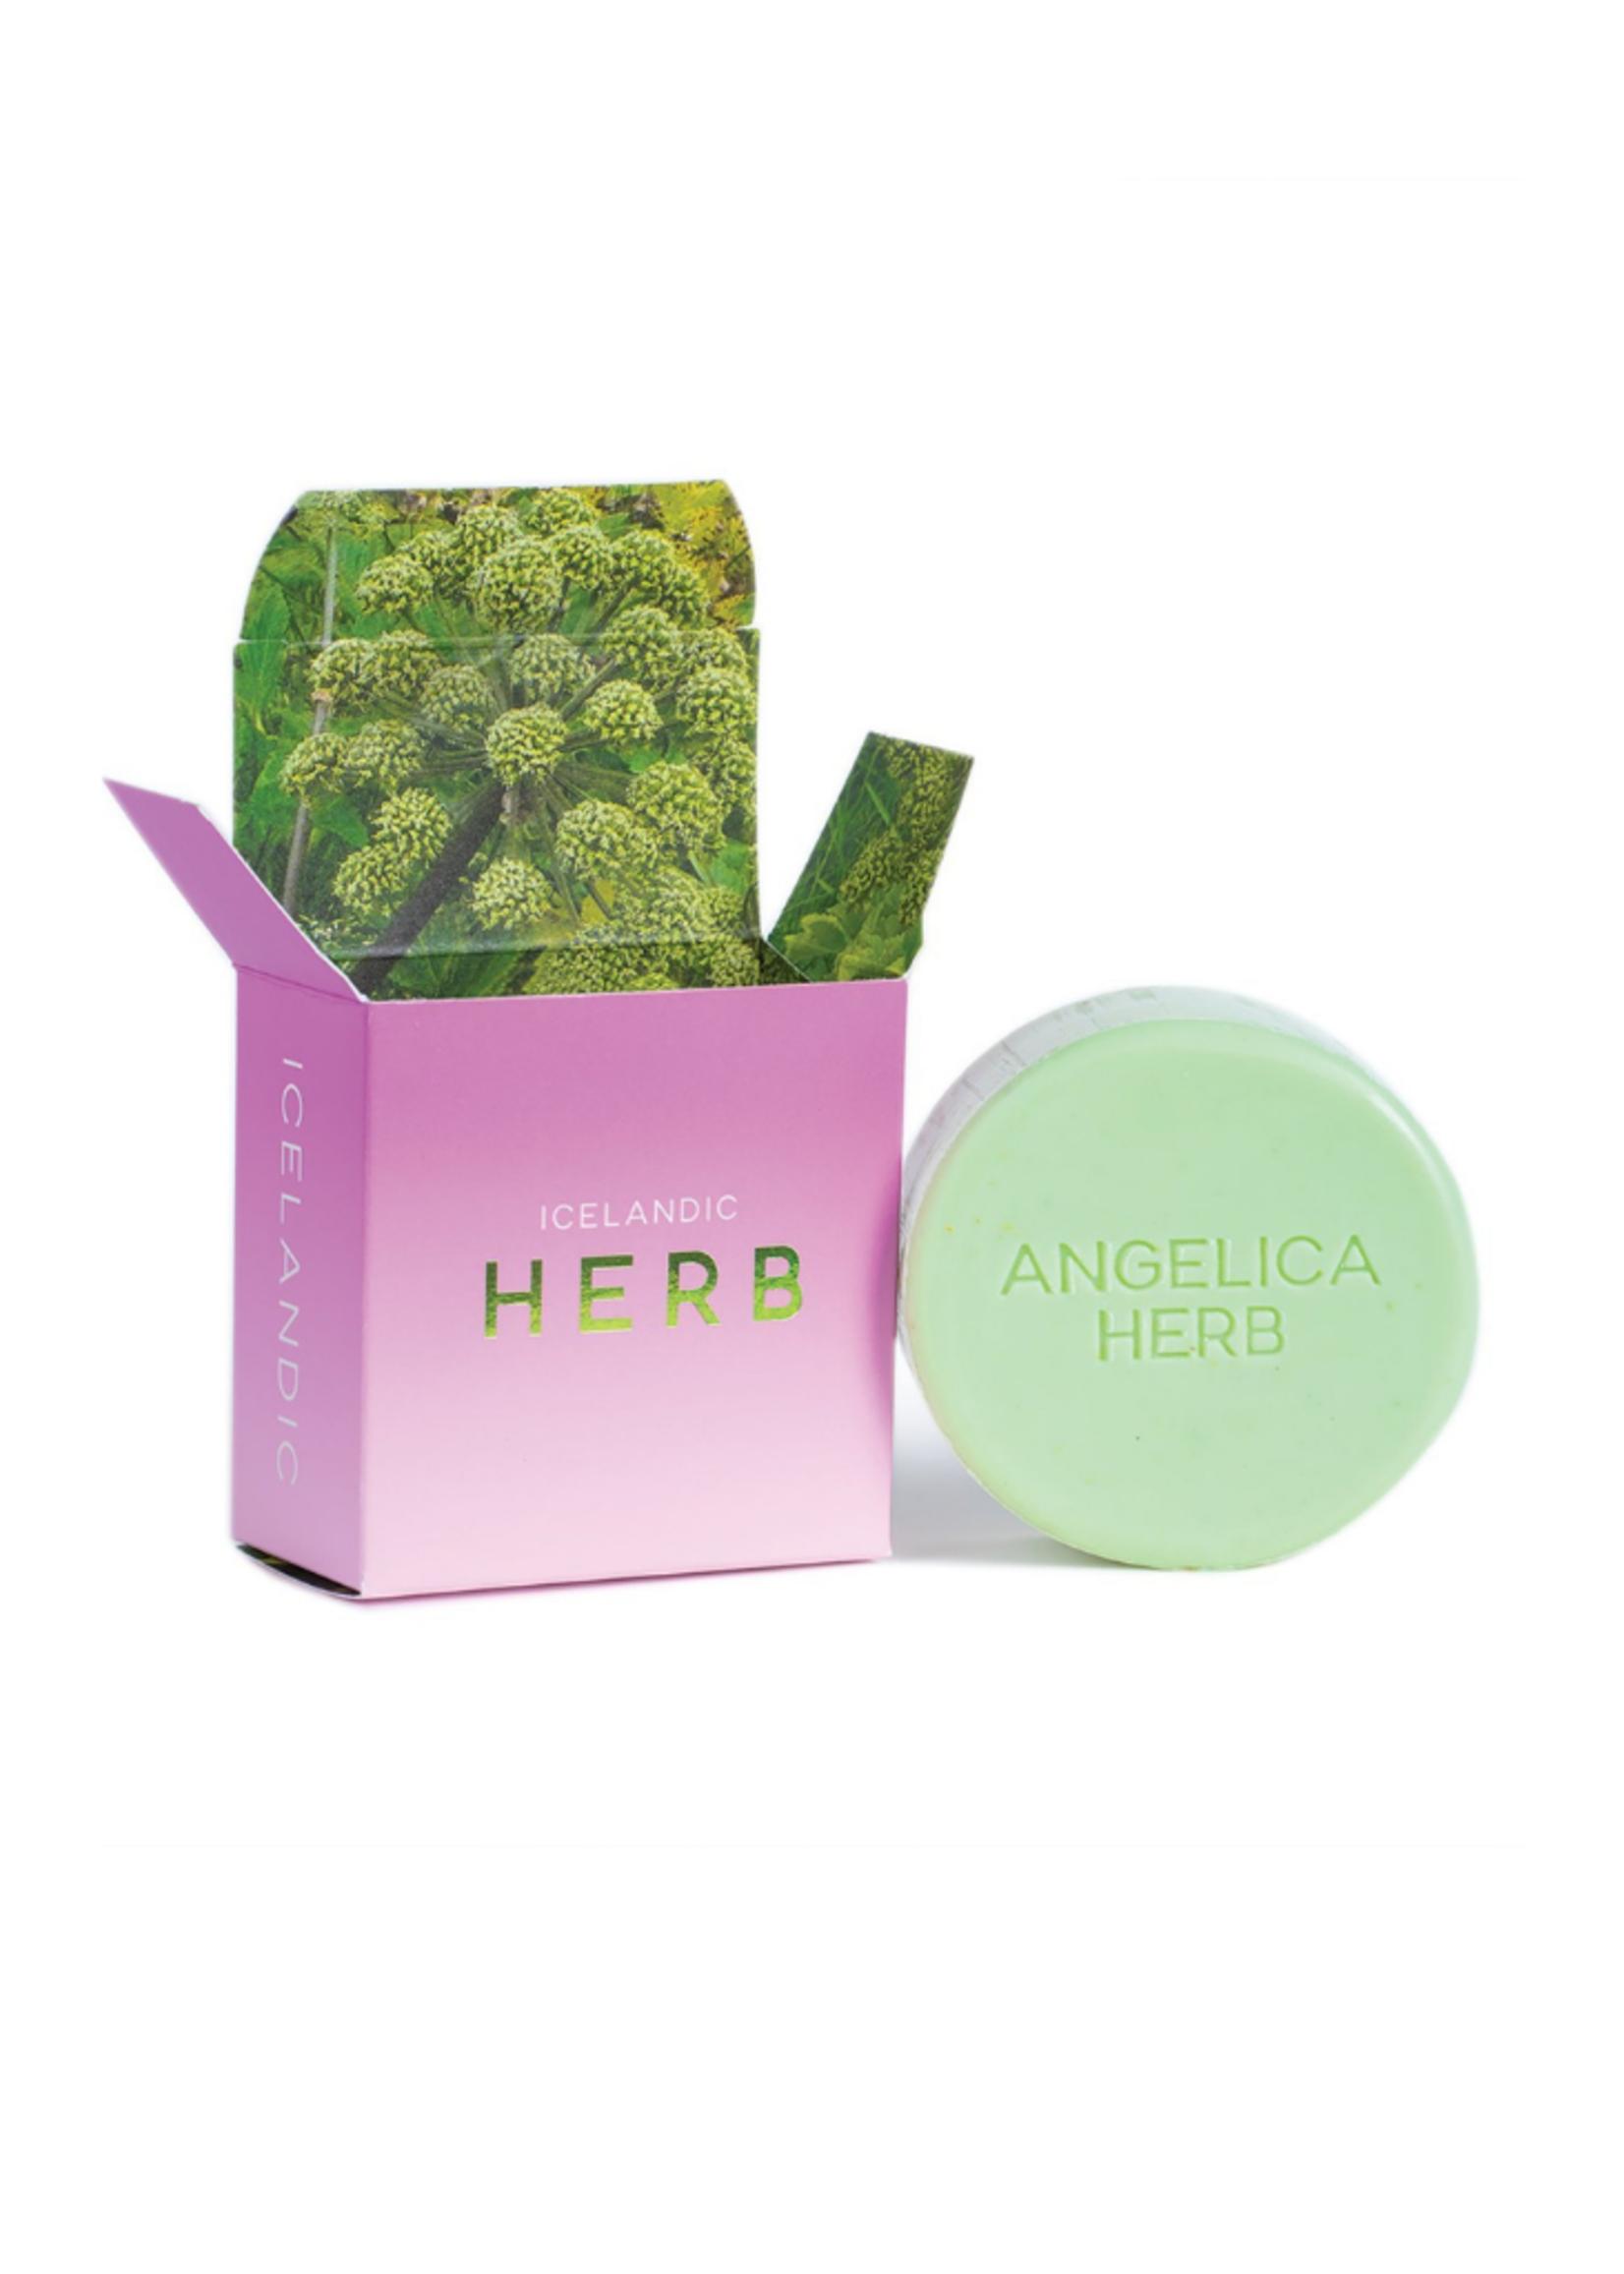 Kala Icelandic Herb Soap